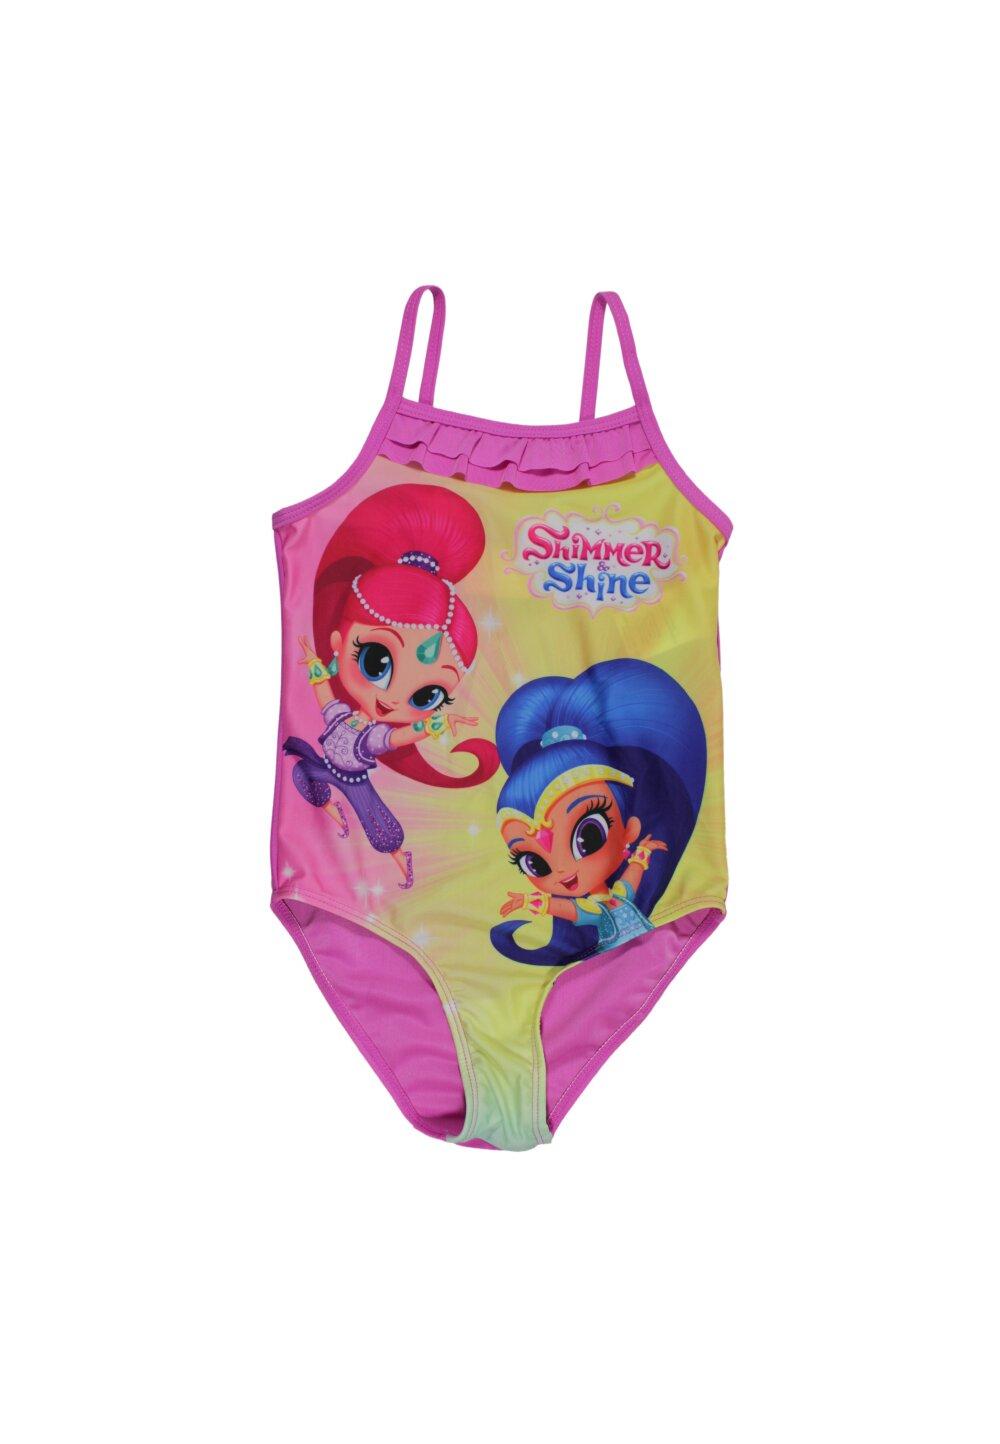 Costum de baie, Shimmer si Shine, roz imagine